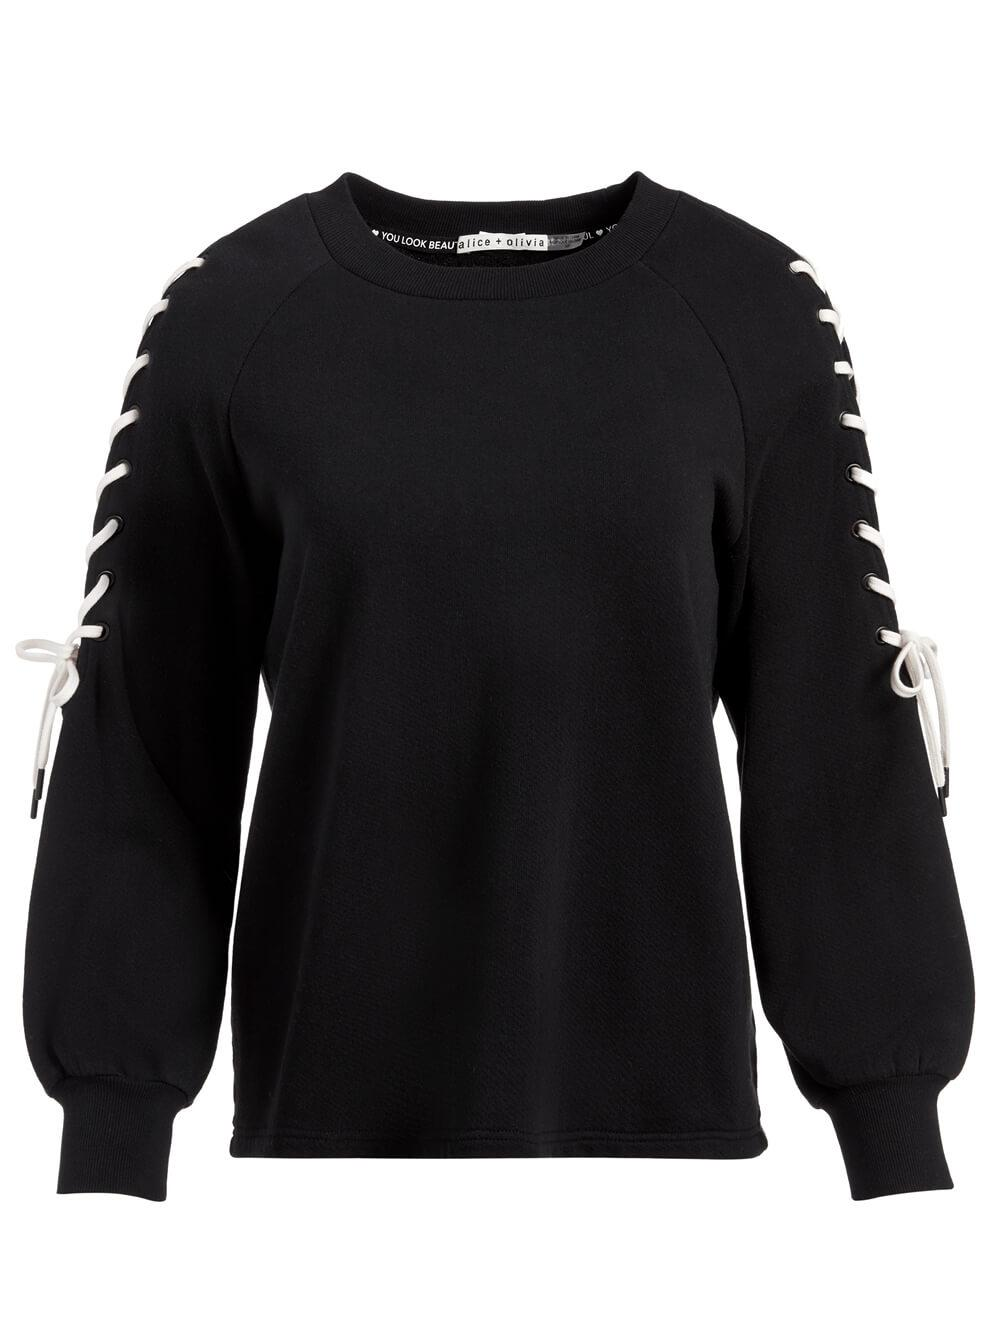 Charlotte Lace Up Sweatshirt Item # CC103W40009